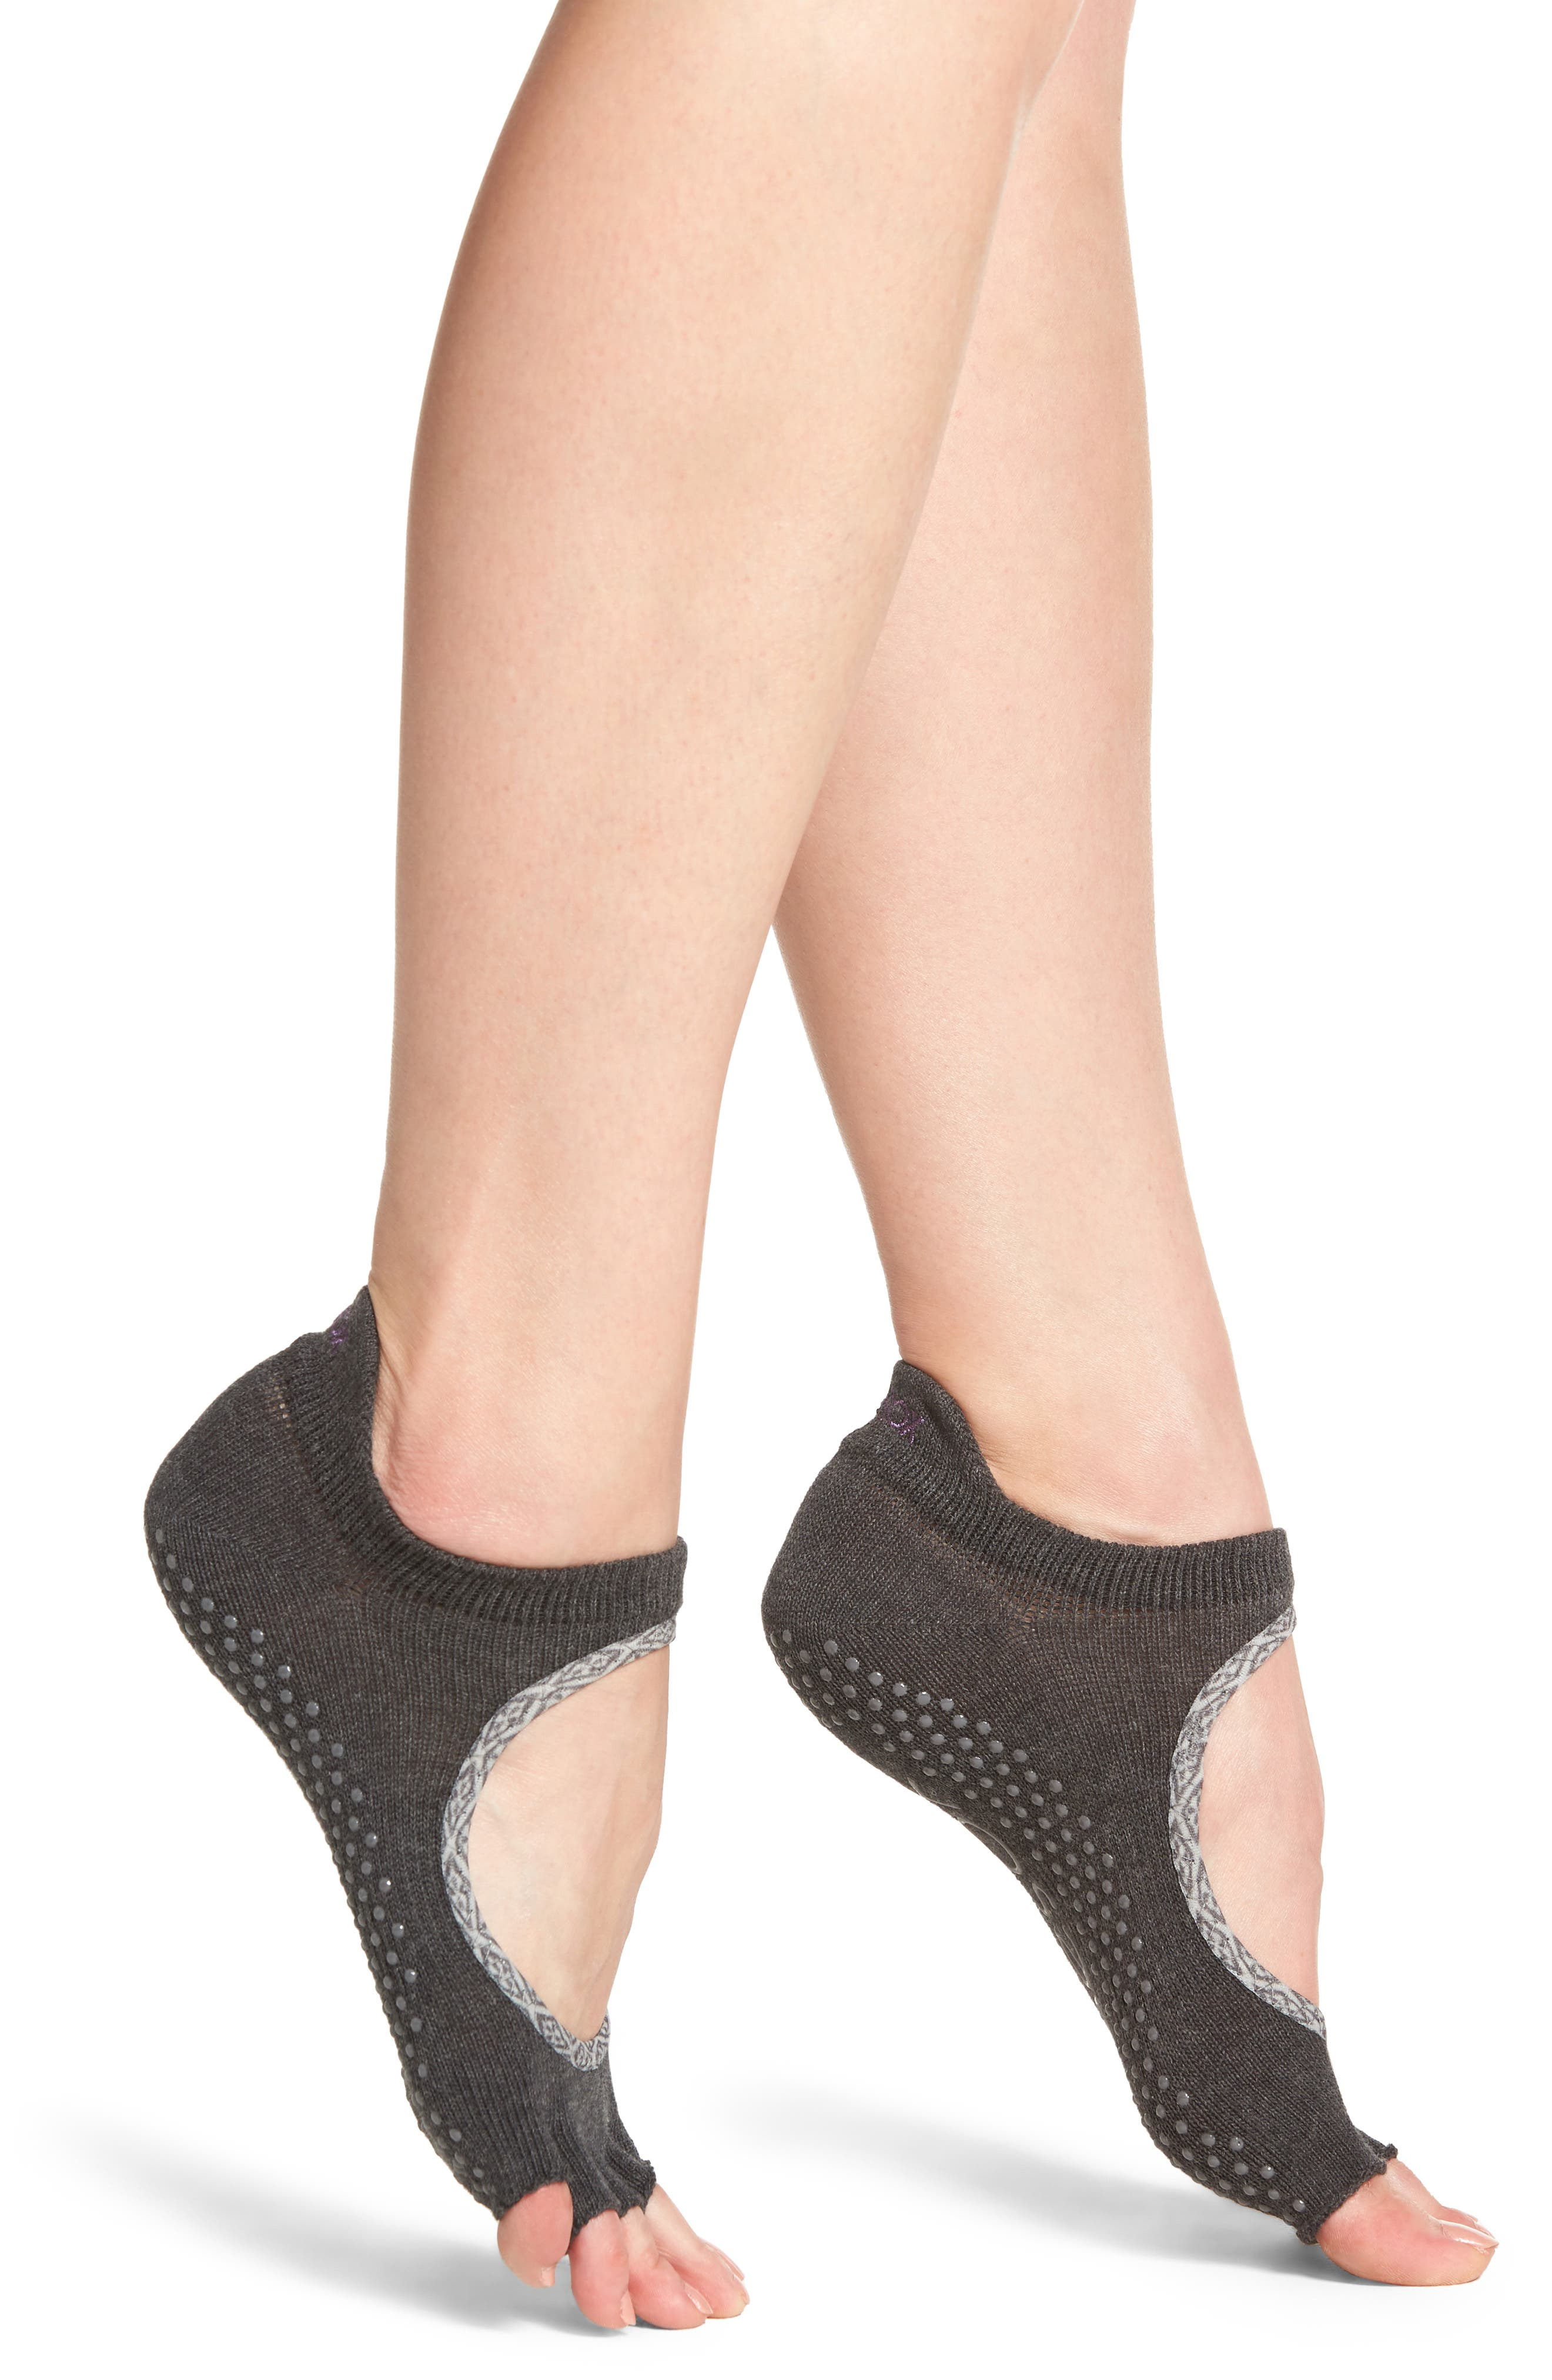 Bellarine Half Toe Gripper Socks,                             Main thumbnail 1, color,                             020